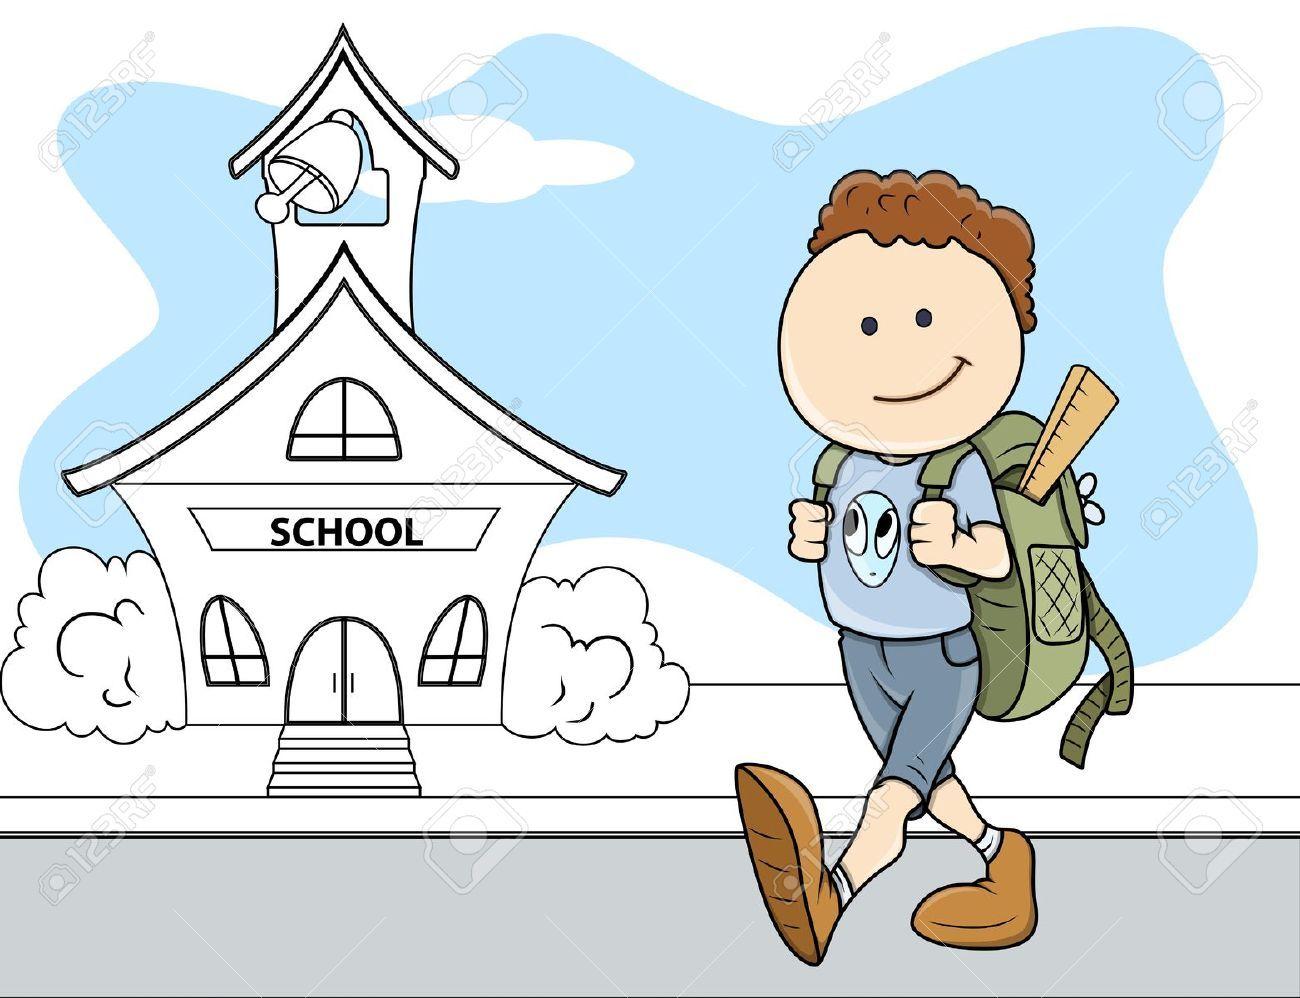 go to school cartoon Google Search Bahasa inggris